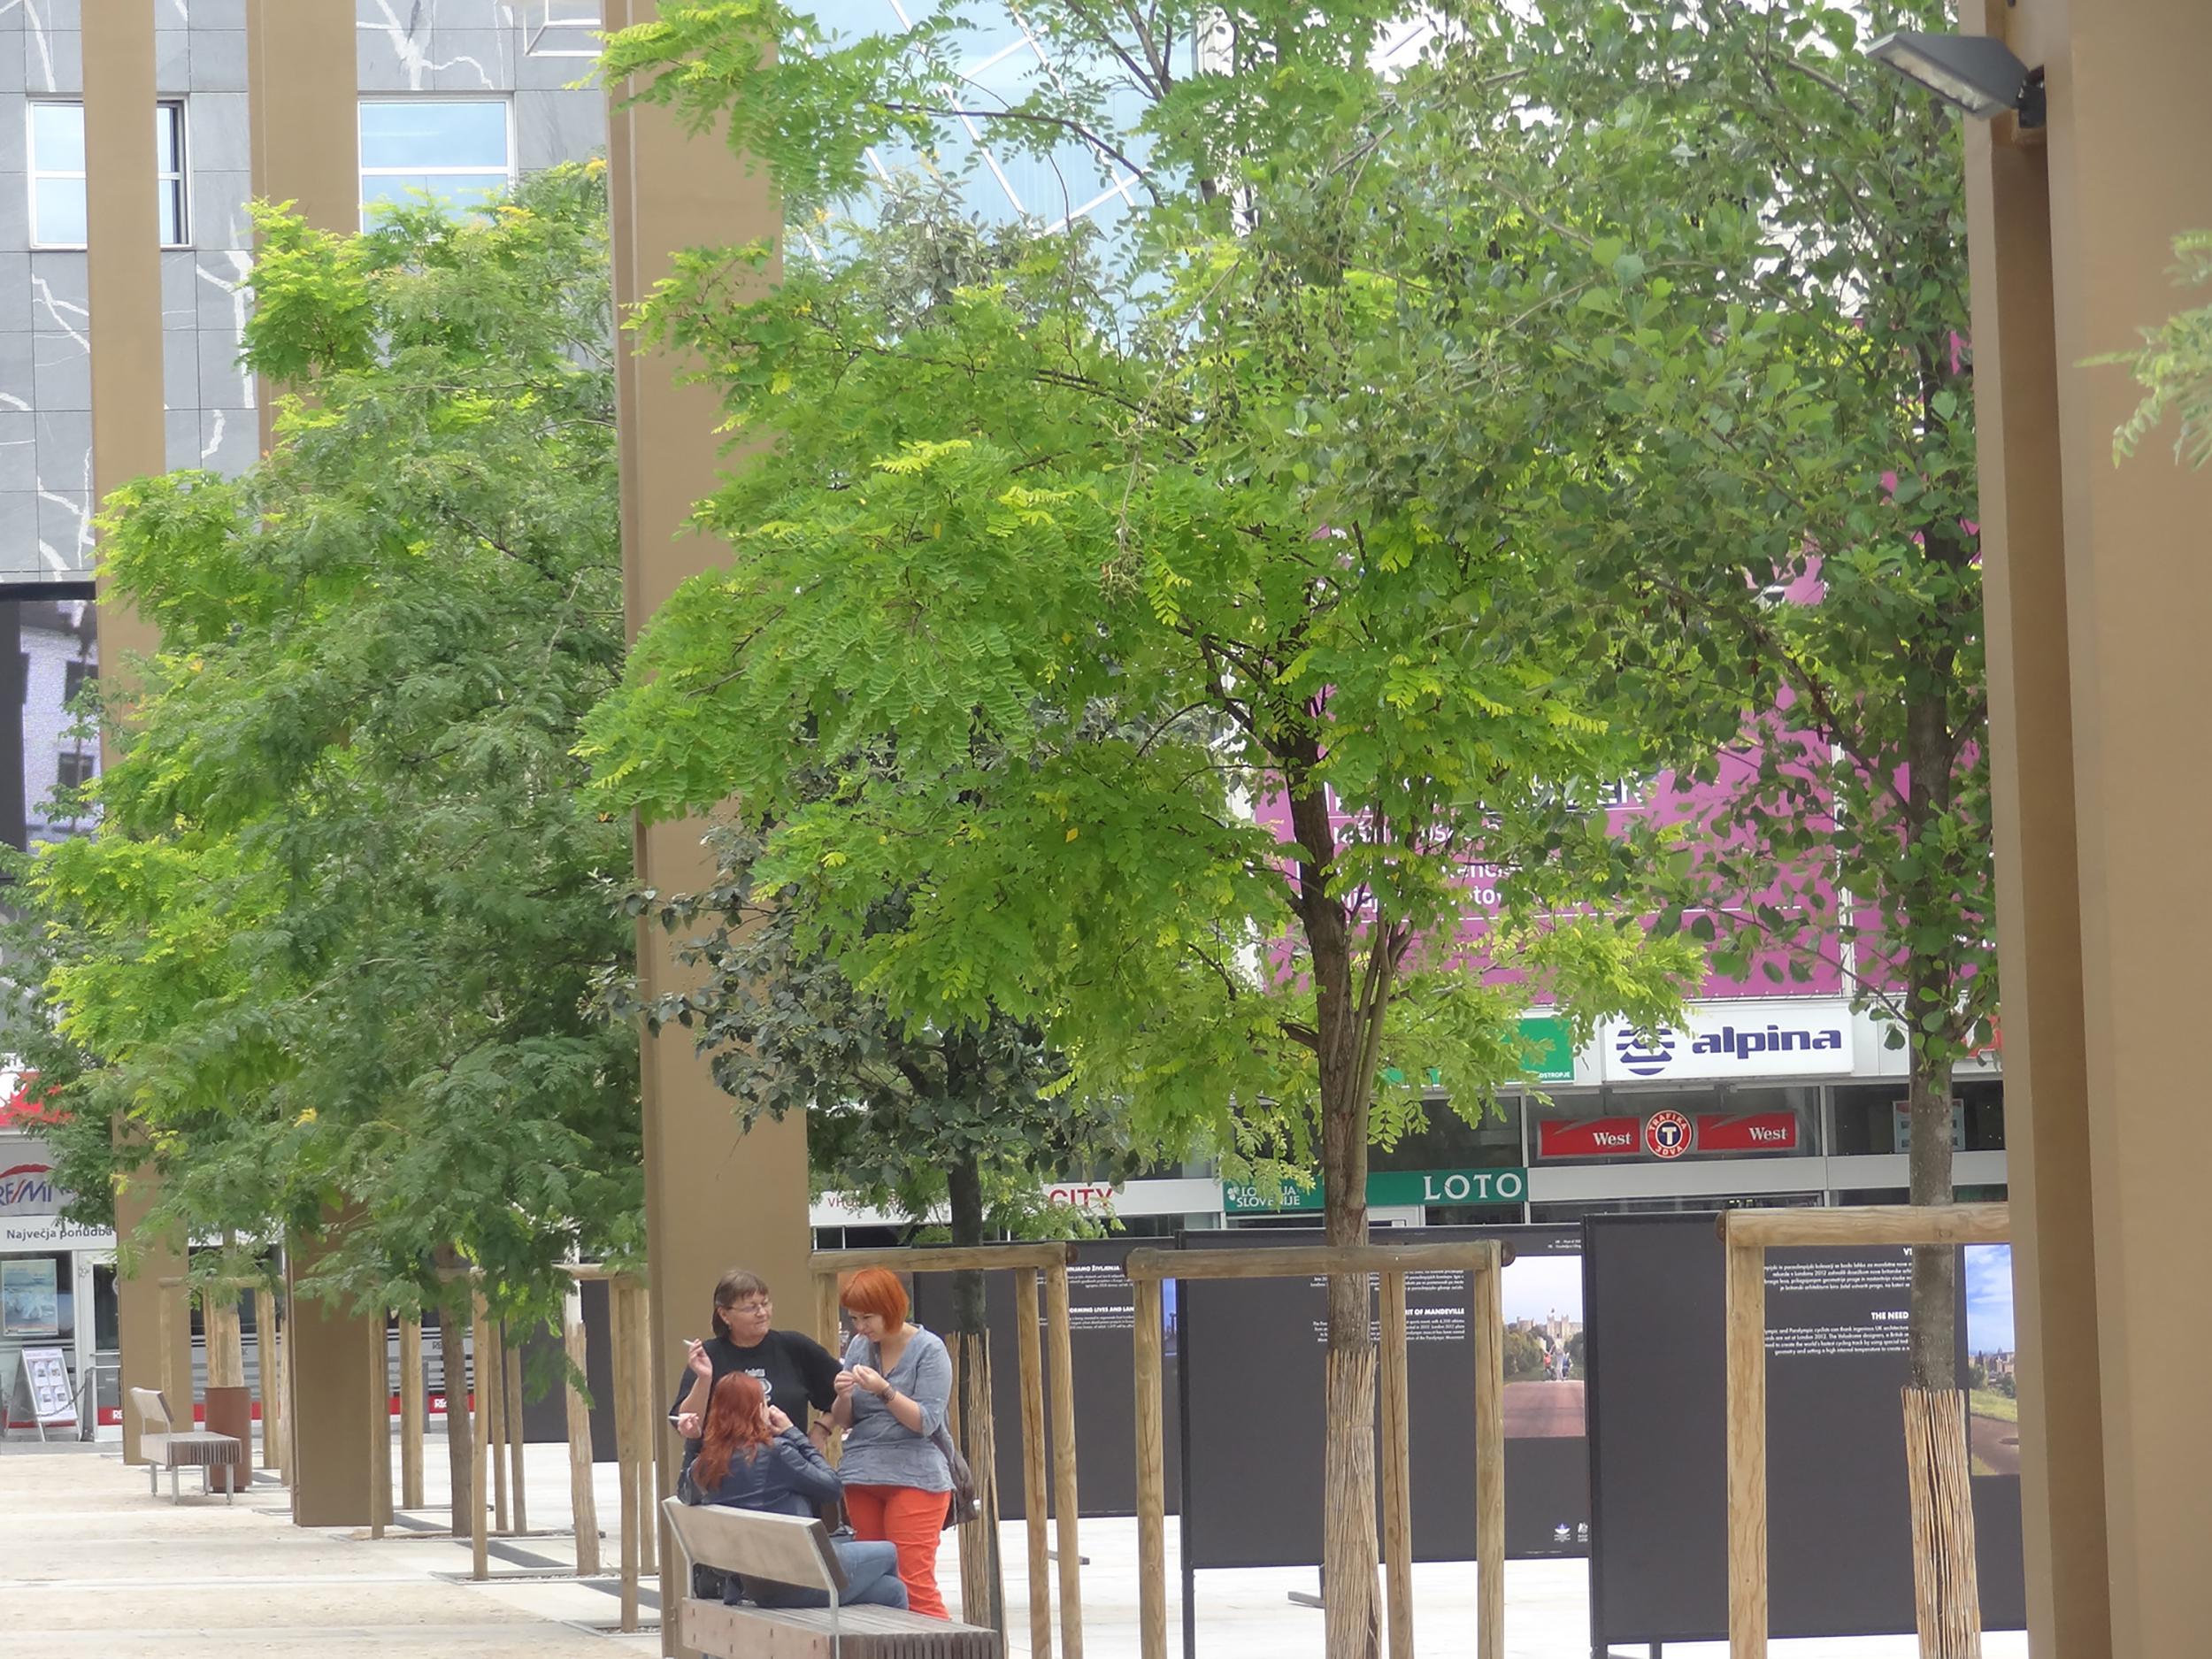 trg leon stukelj maribor bruto square urban tree line drevored